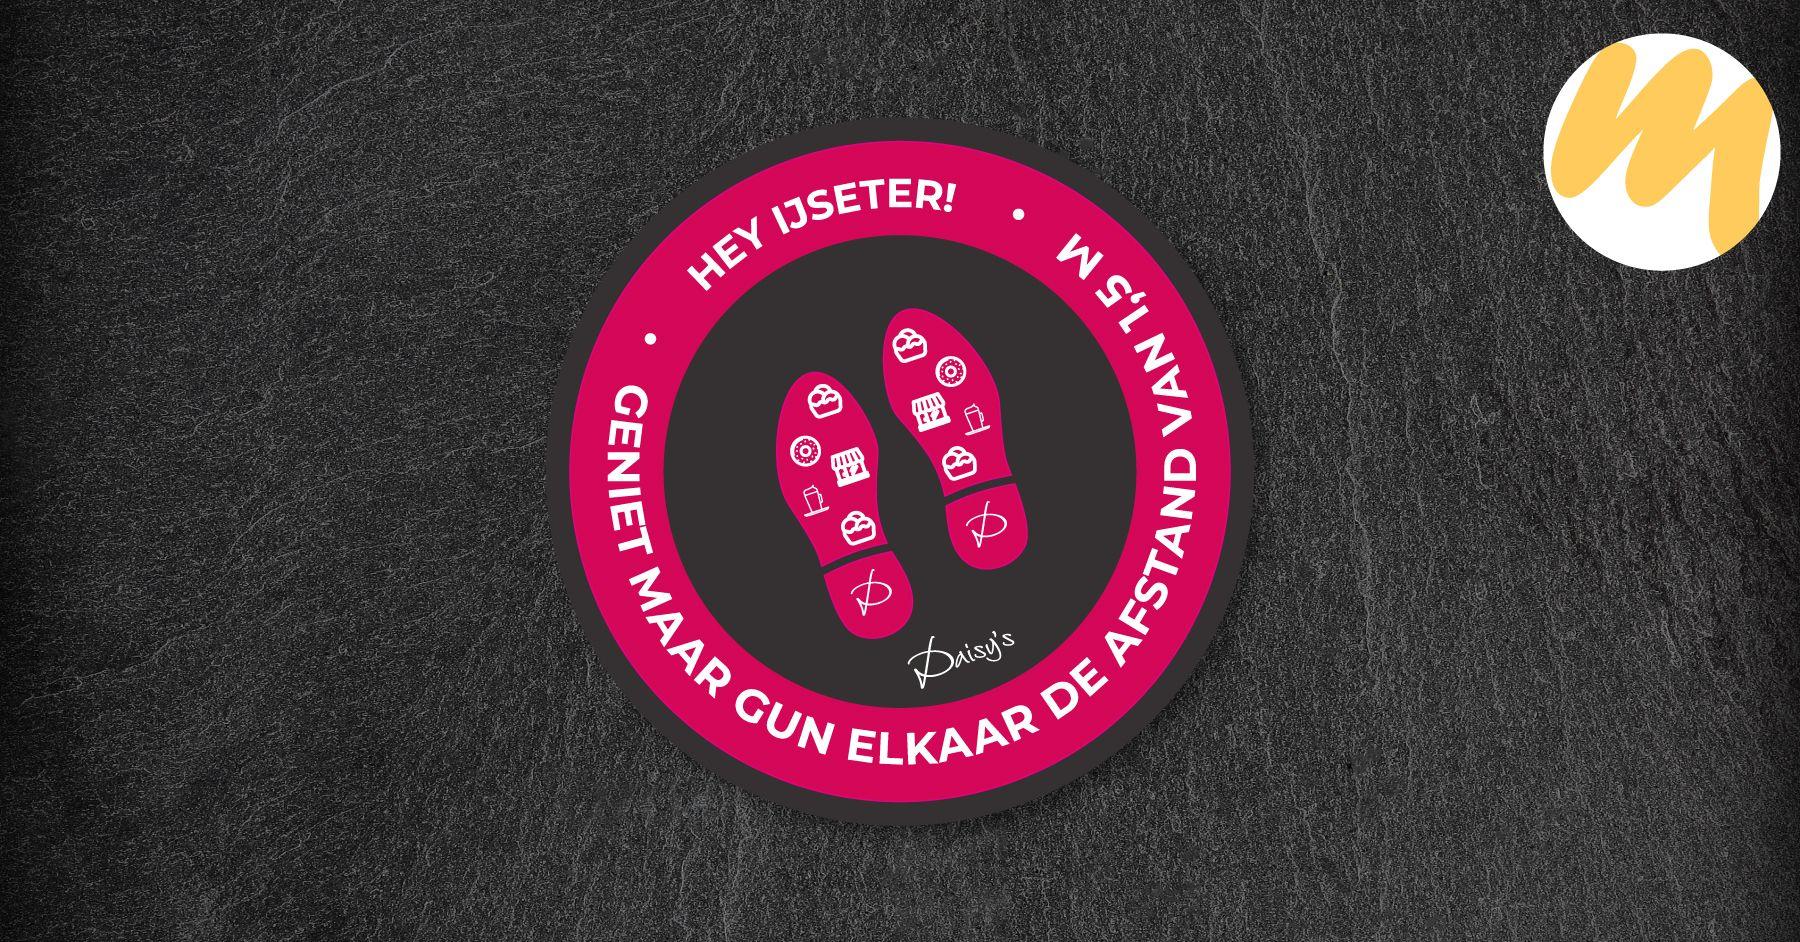 Vloersticker voor IJssalon Daisys's te Tiel | Grafisch design - Esmy Media Design